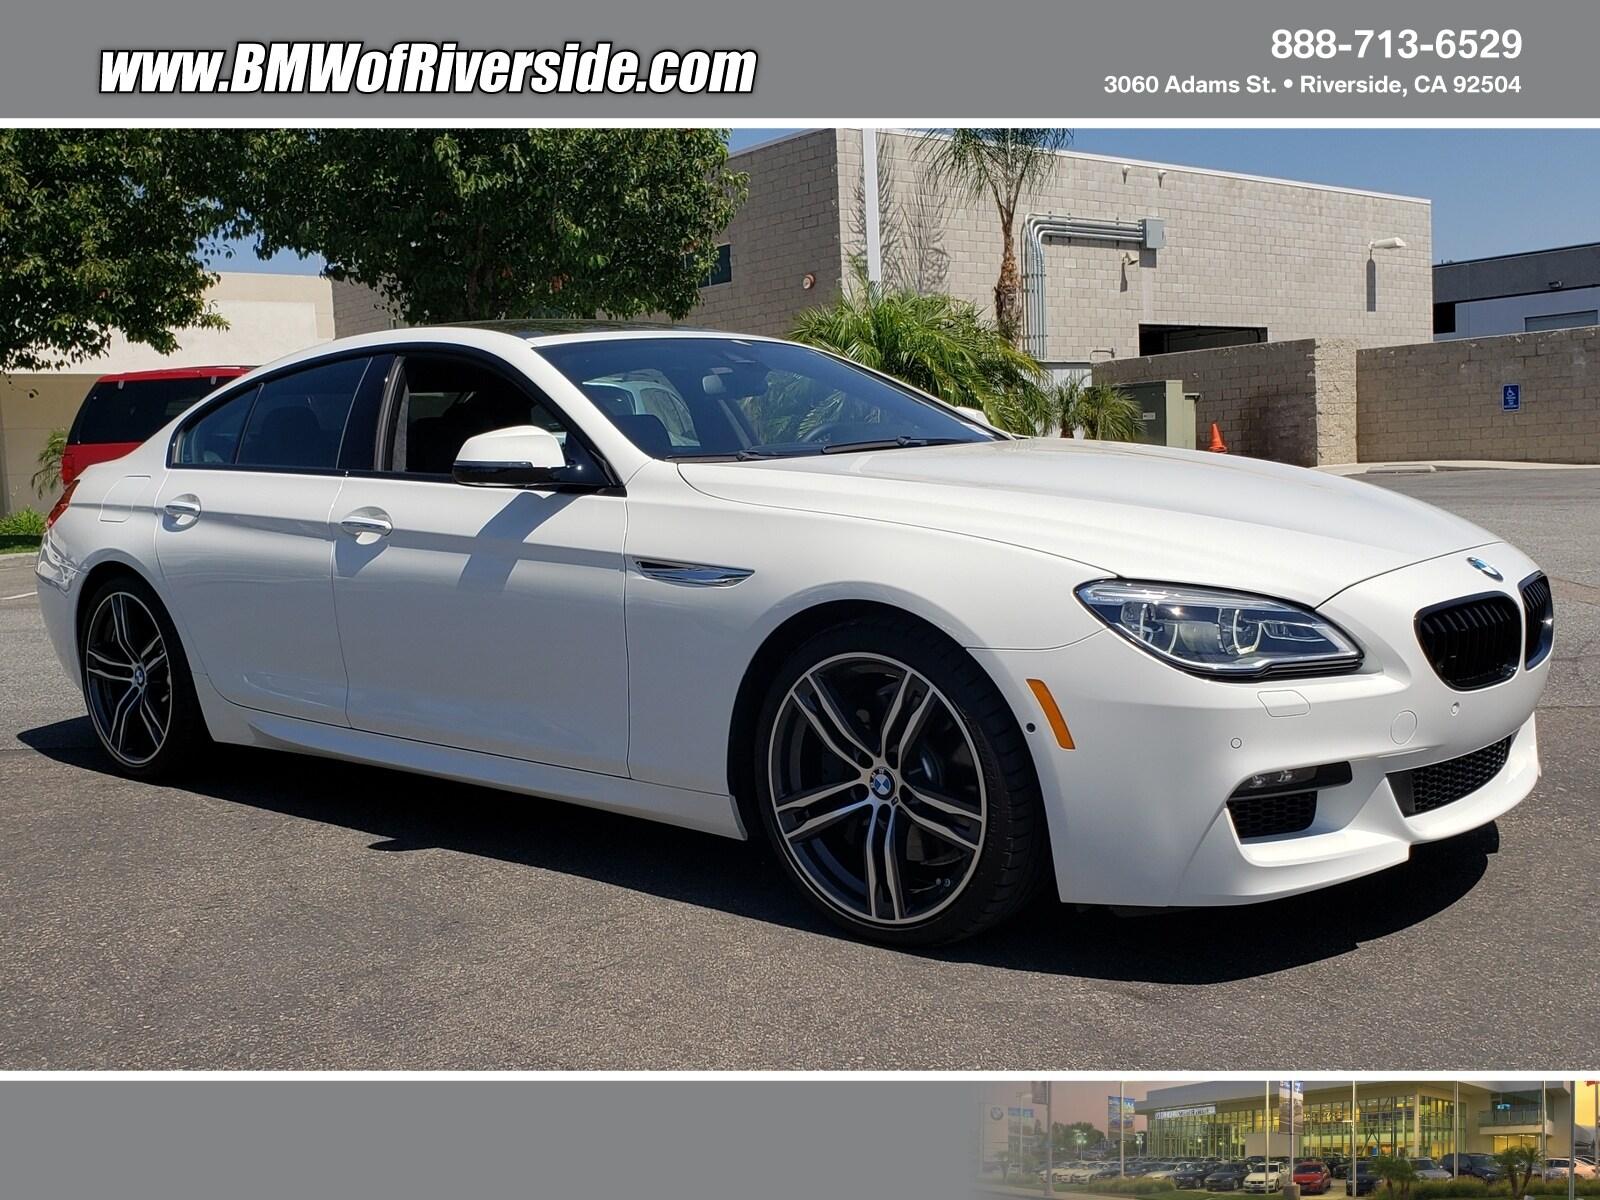 2018 BMW 6 Series 650I Gran Coupe Xdrive Gran Coupe